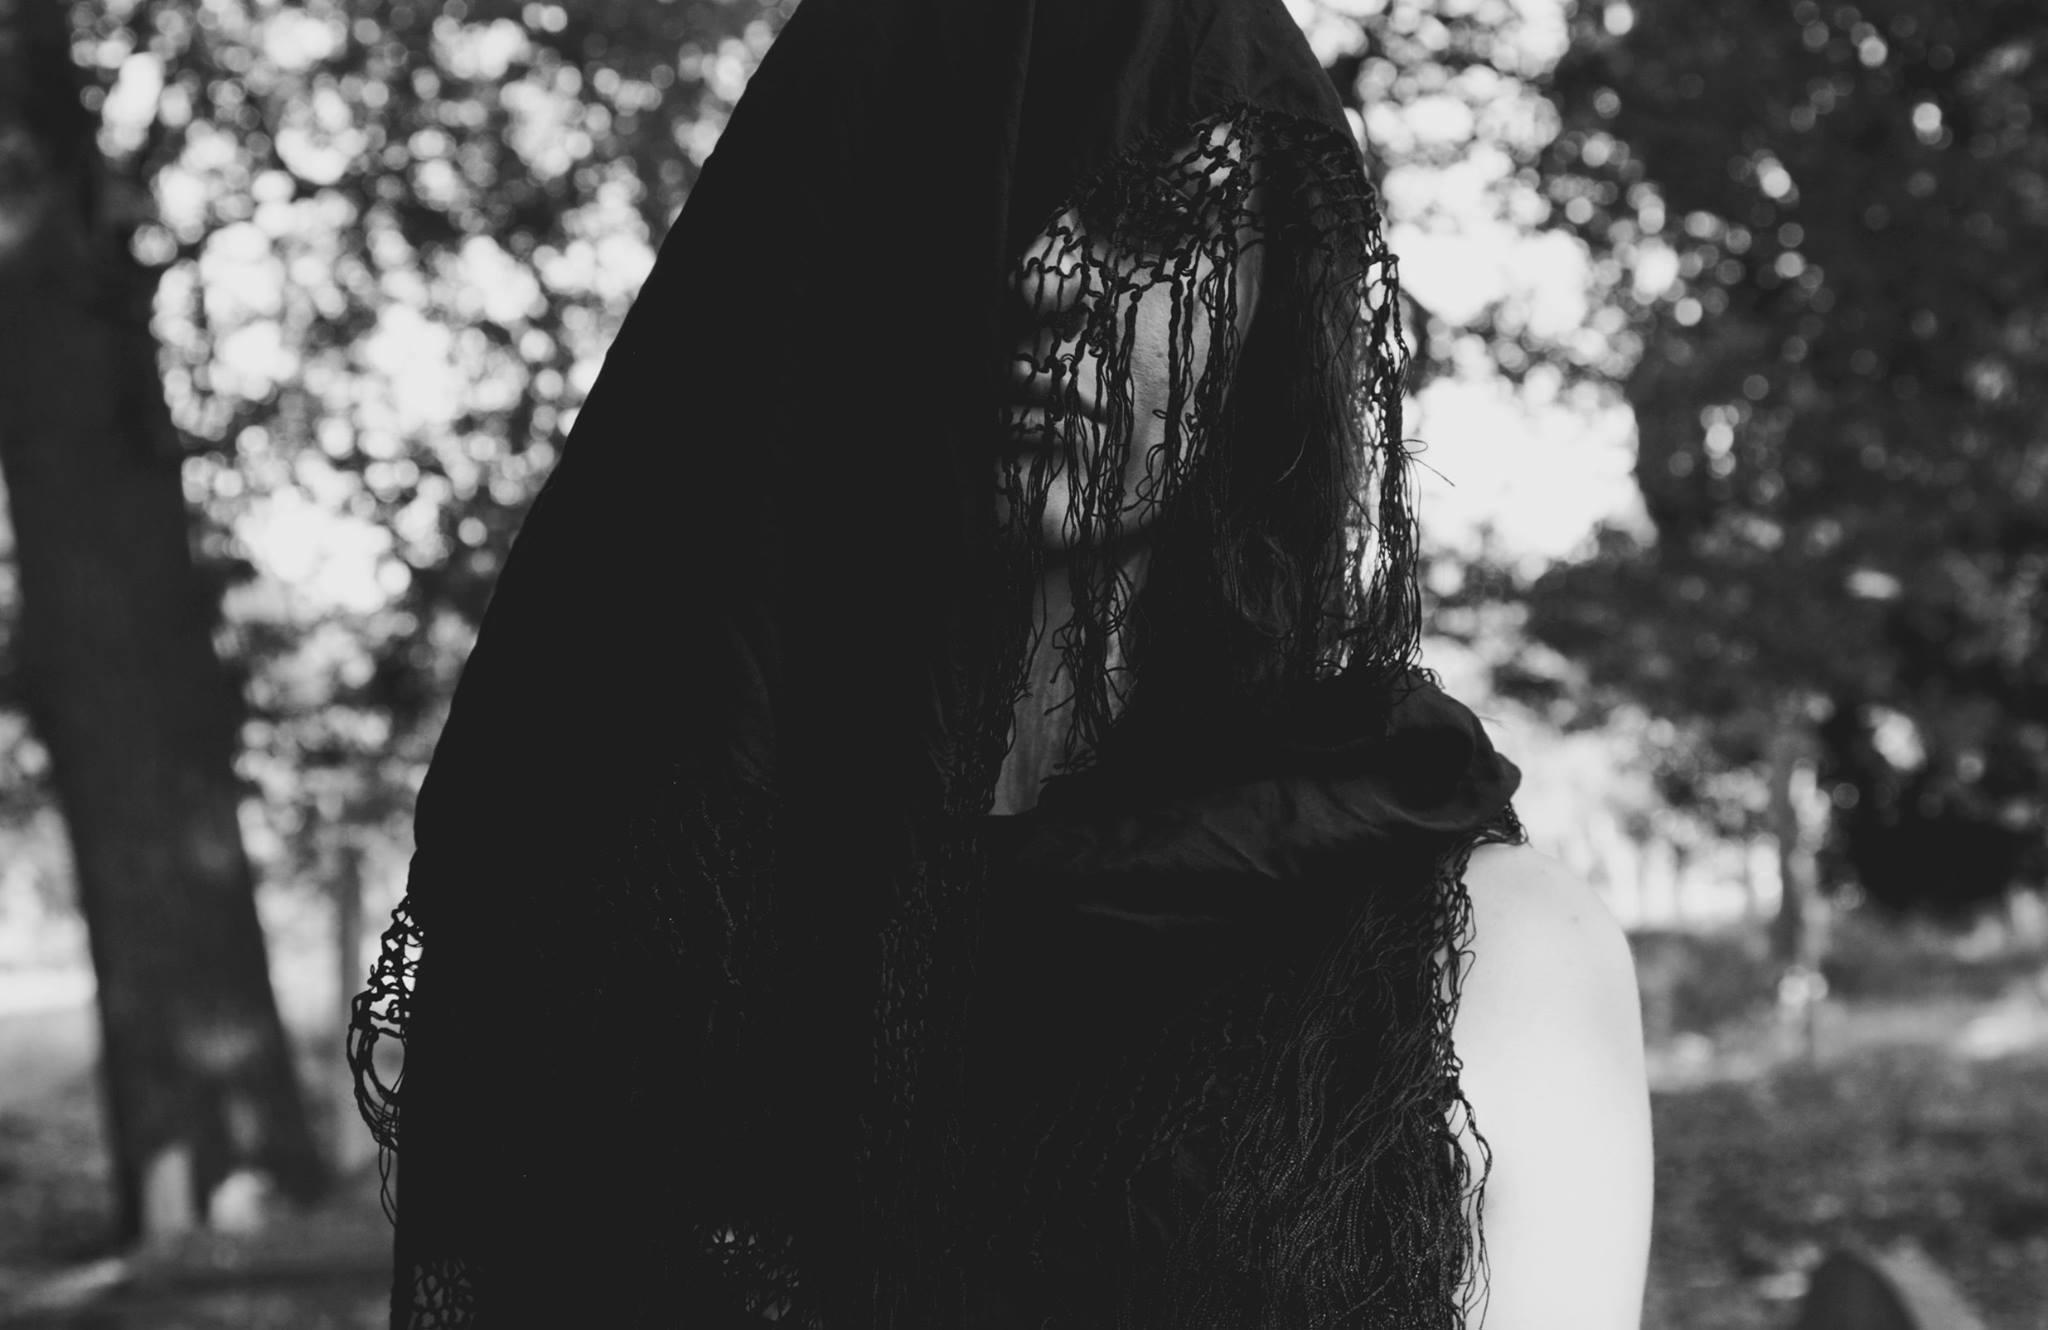 Photographer: Zuleika Frey